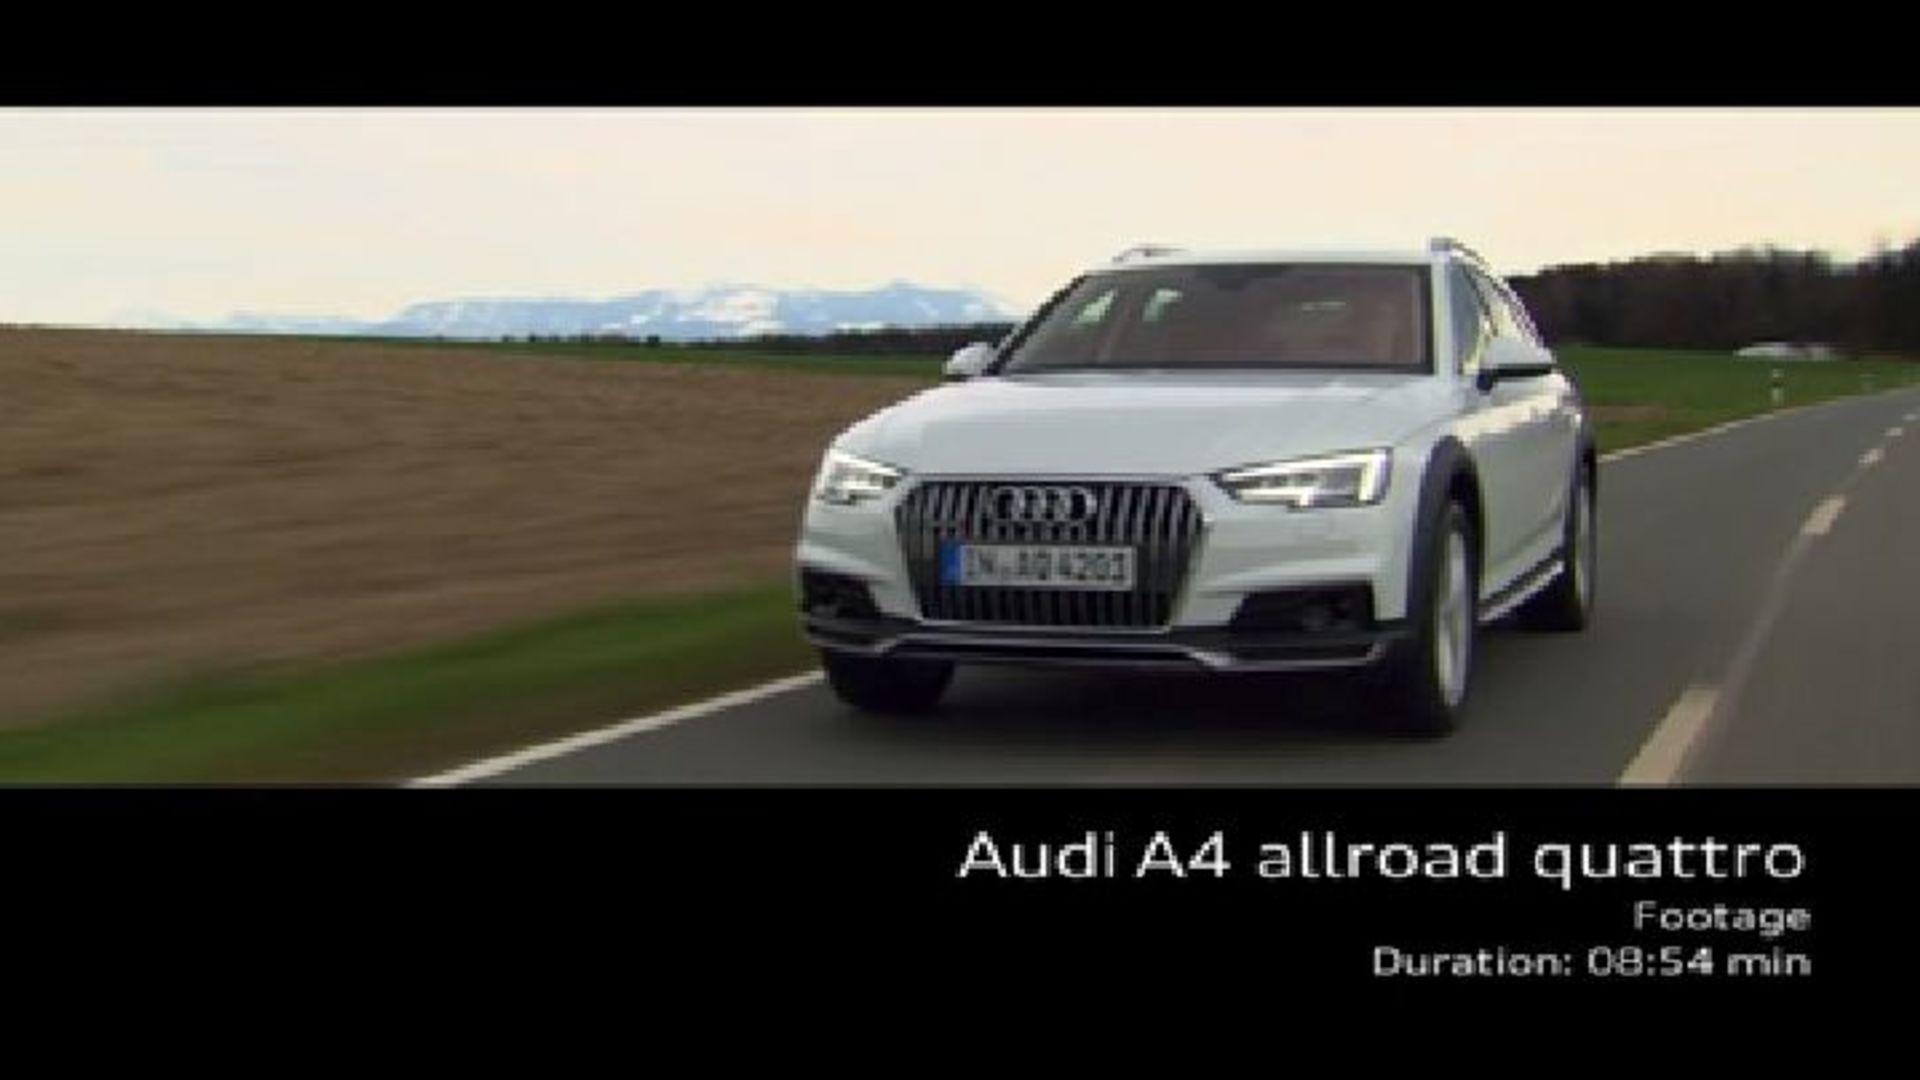 Footage Audi A4 allroad quattro (2015)